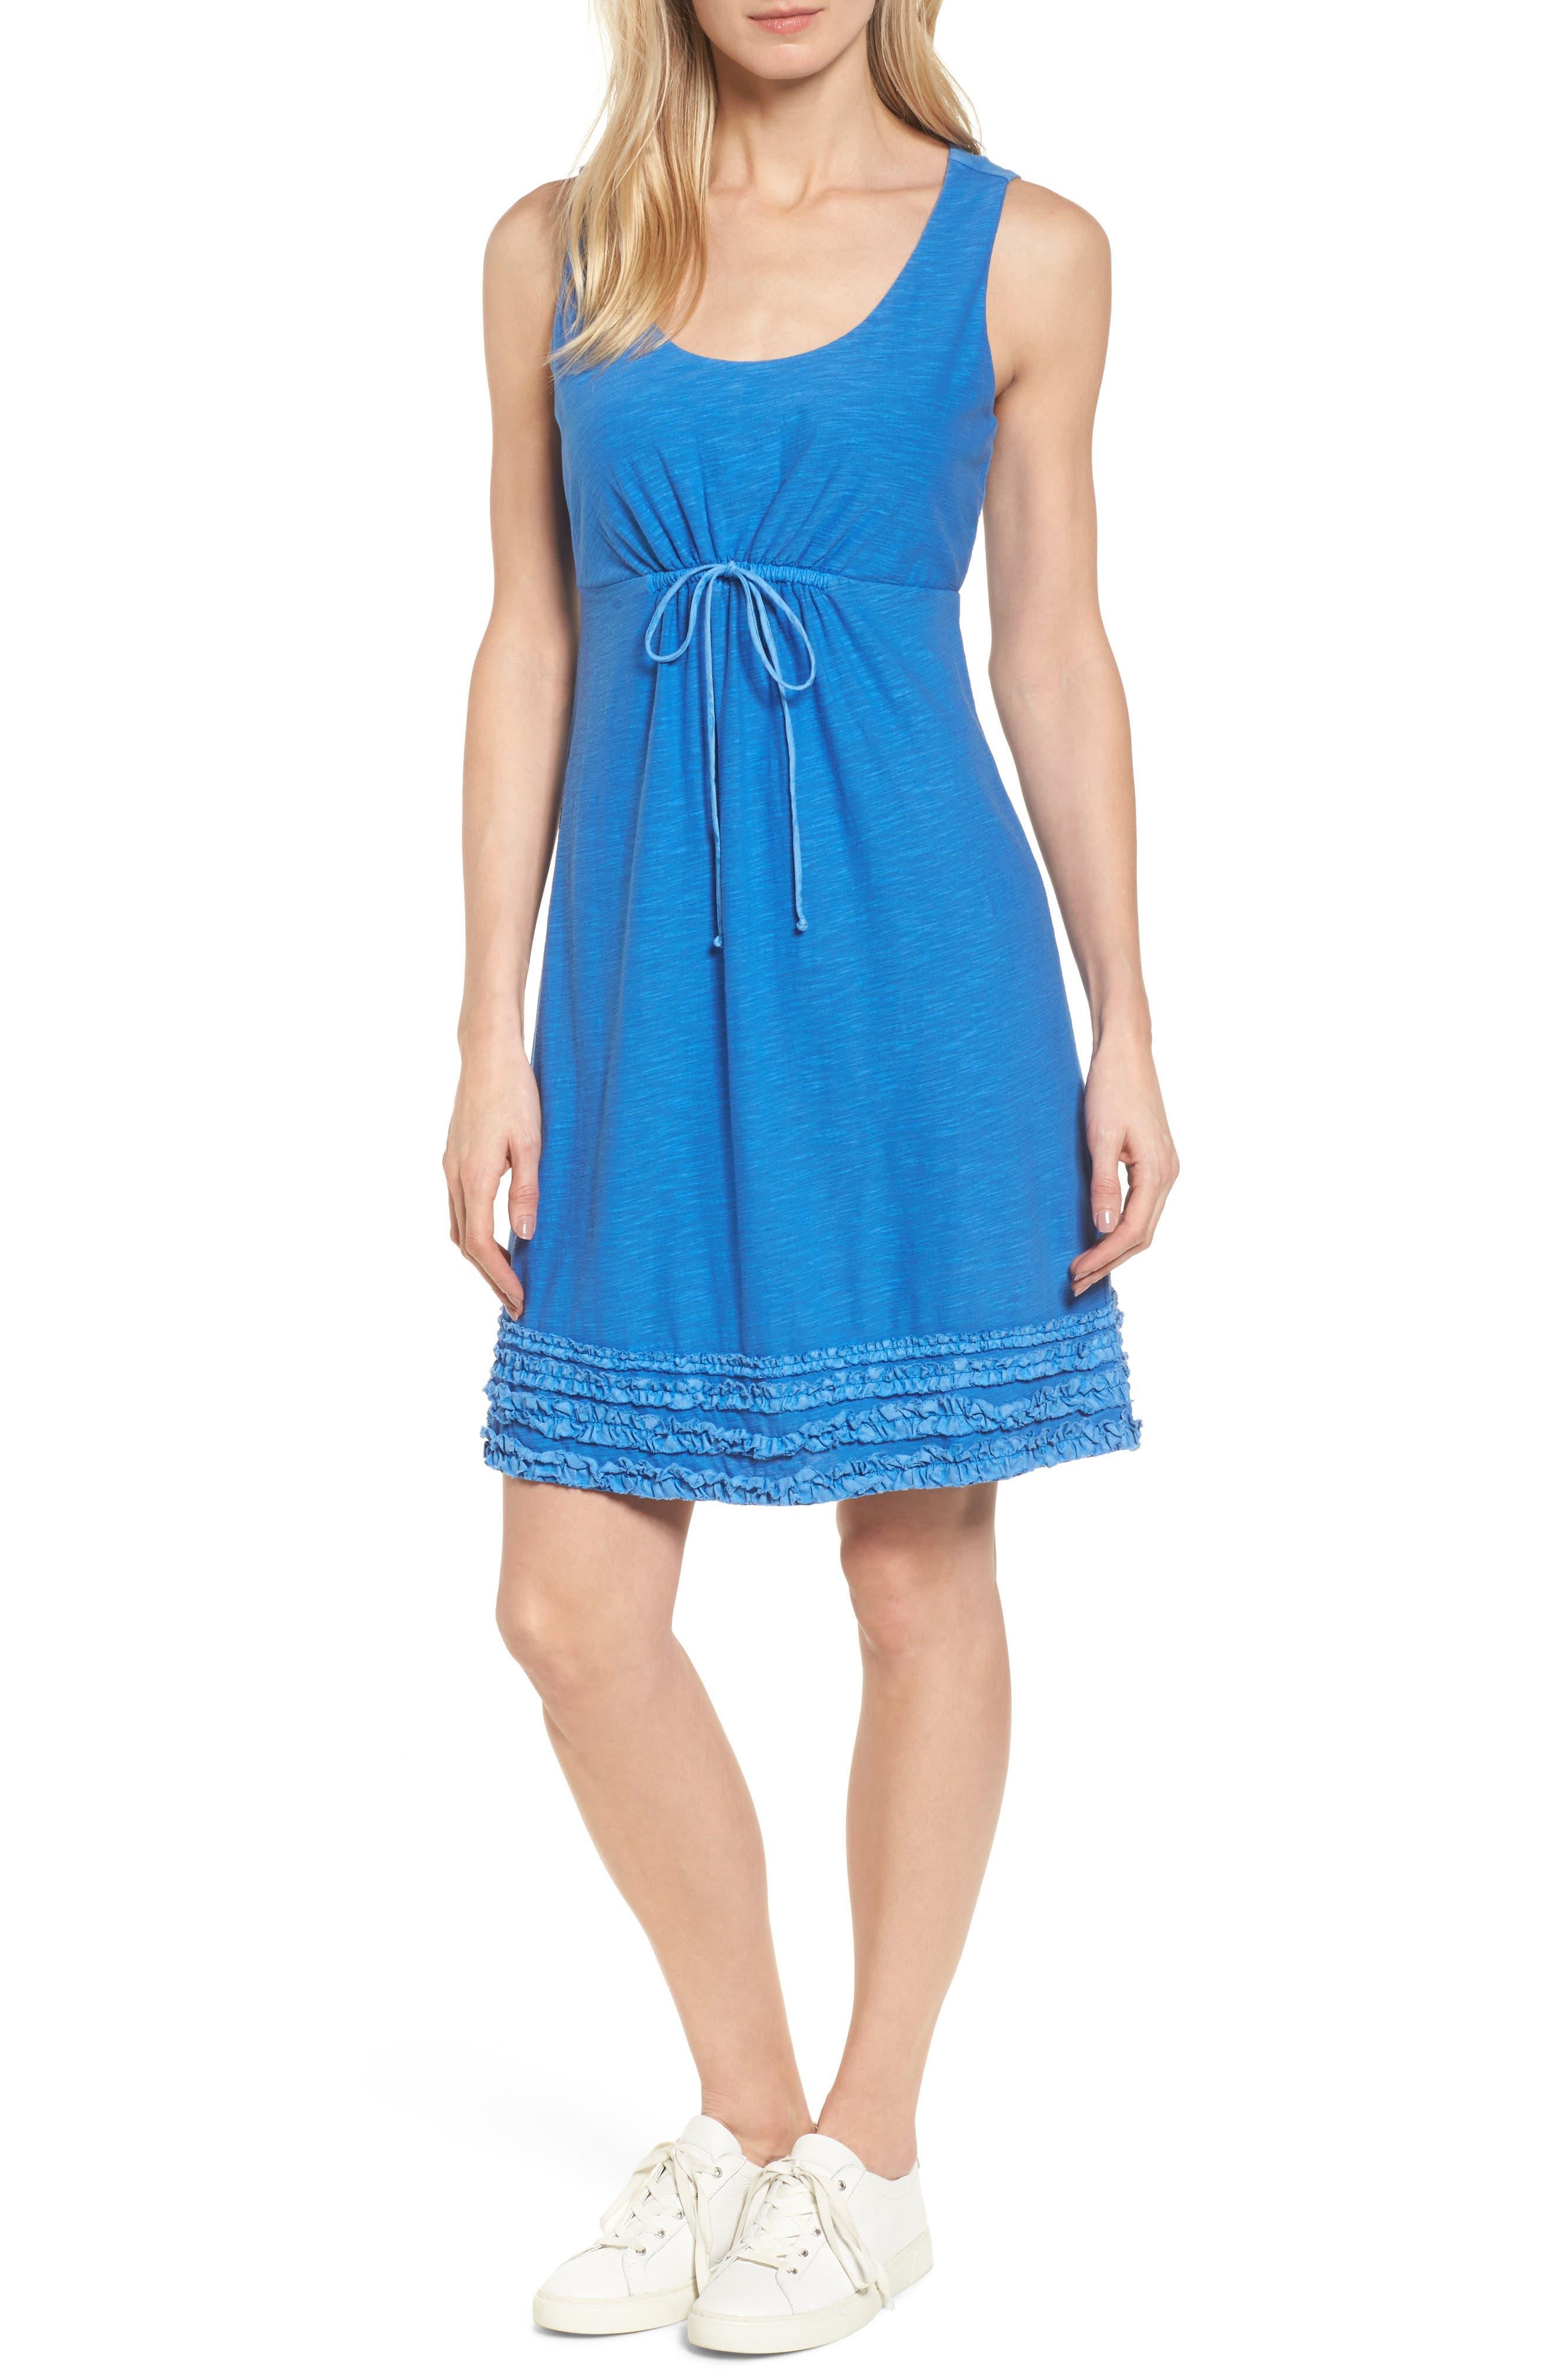 Alternate Image 1 Selected - Tommy Bahama Arden Ruffle Hem Dress